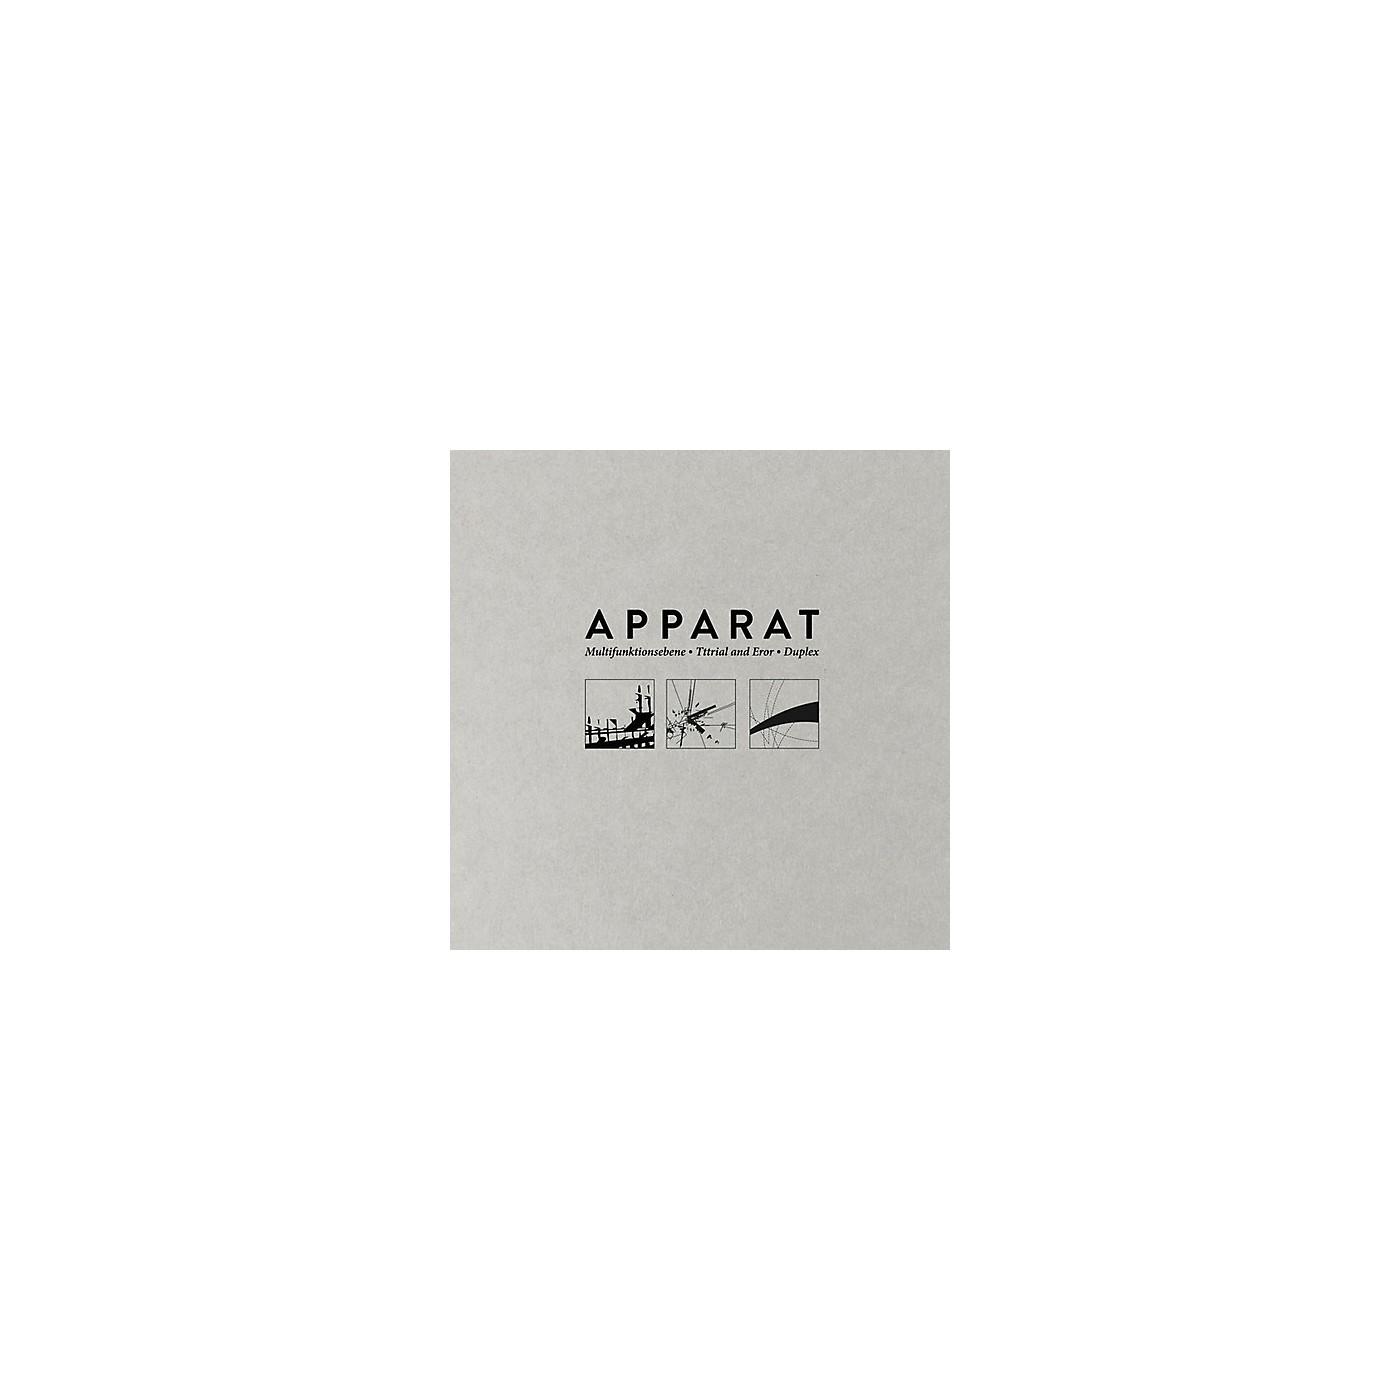 Alliance Apparat - Multifunktionsebene, Tttrial and Eror, Duplex thumbnail